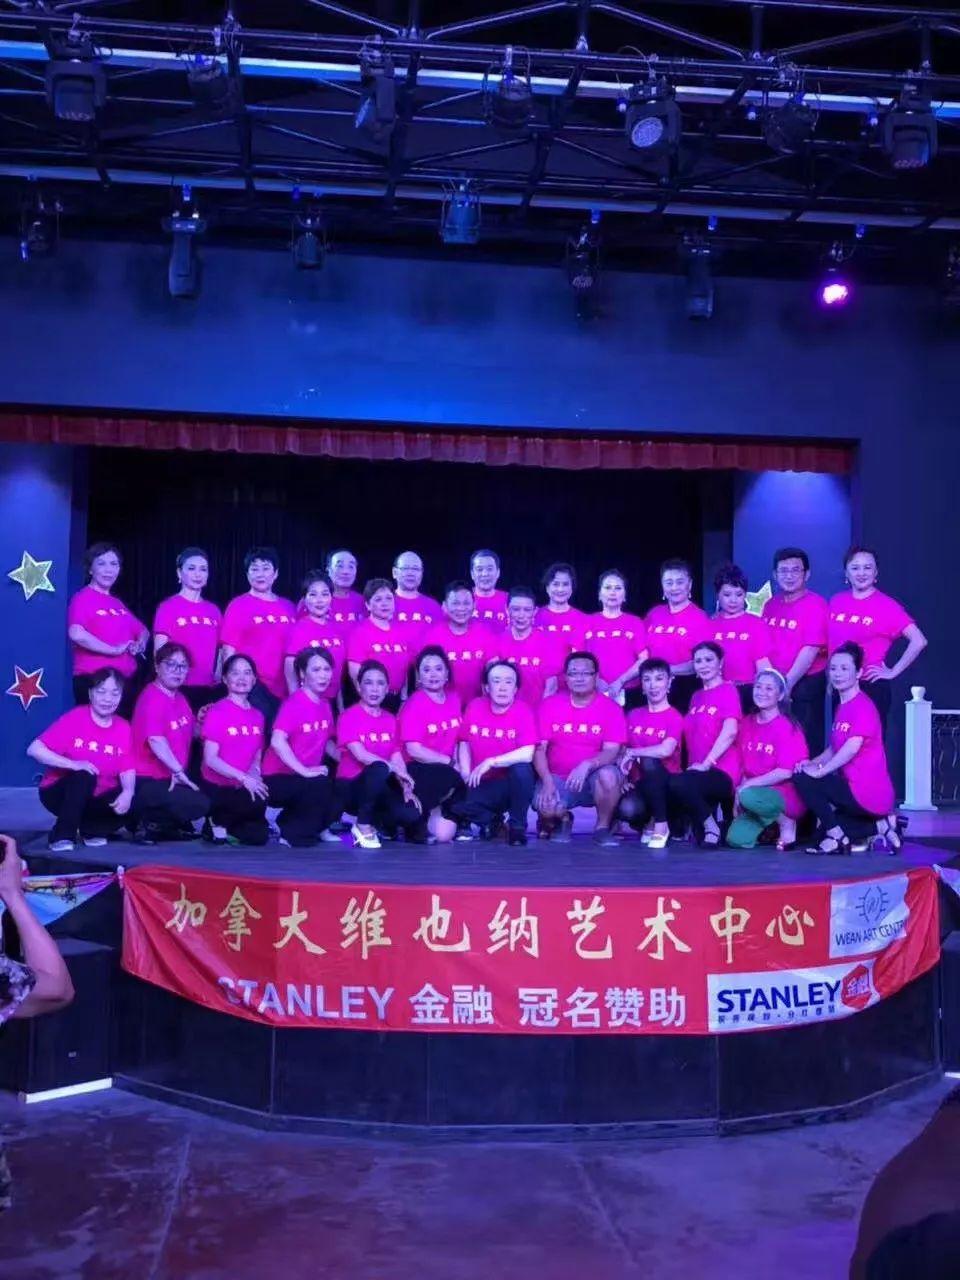 【STANLEY 金融】 冠名赞助的 【维也纳艺术中心】在海外刮起了一股中国风